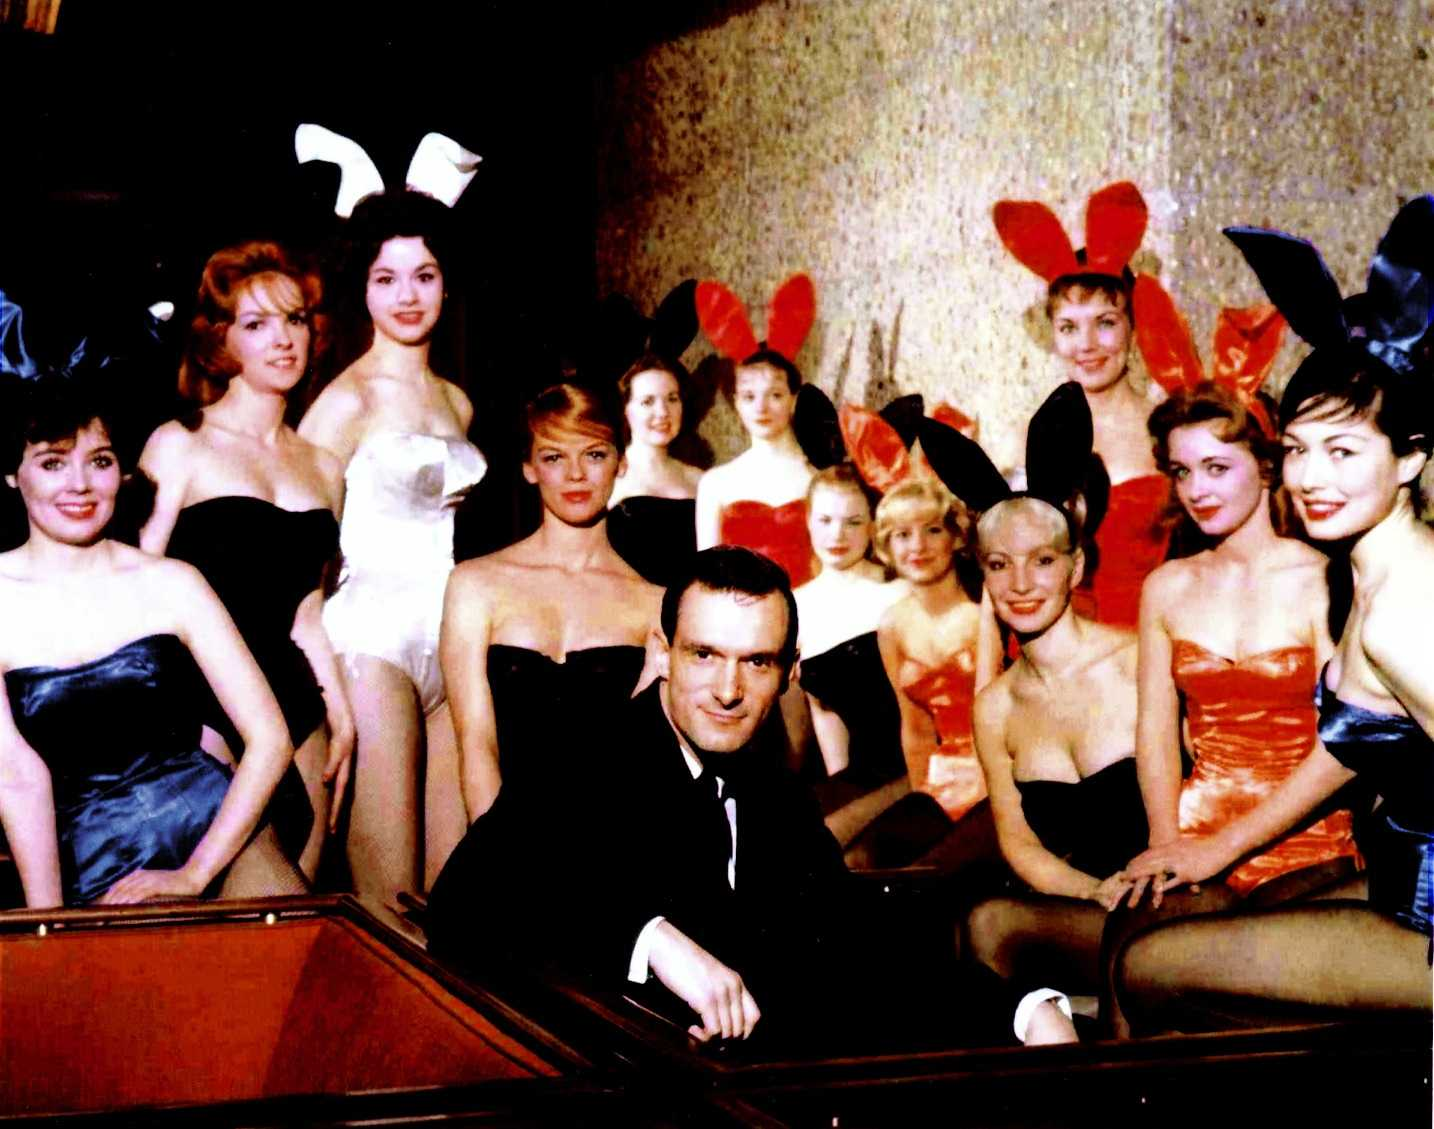 History racconta la storia del mensile Playboy | Digitale terrestre: Dtti.it